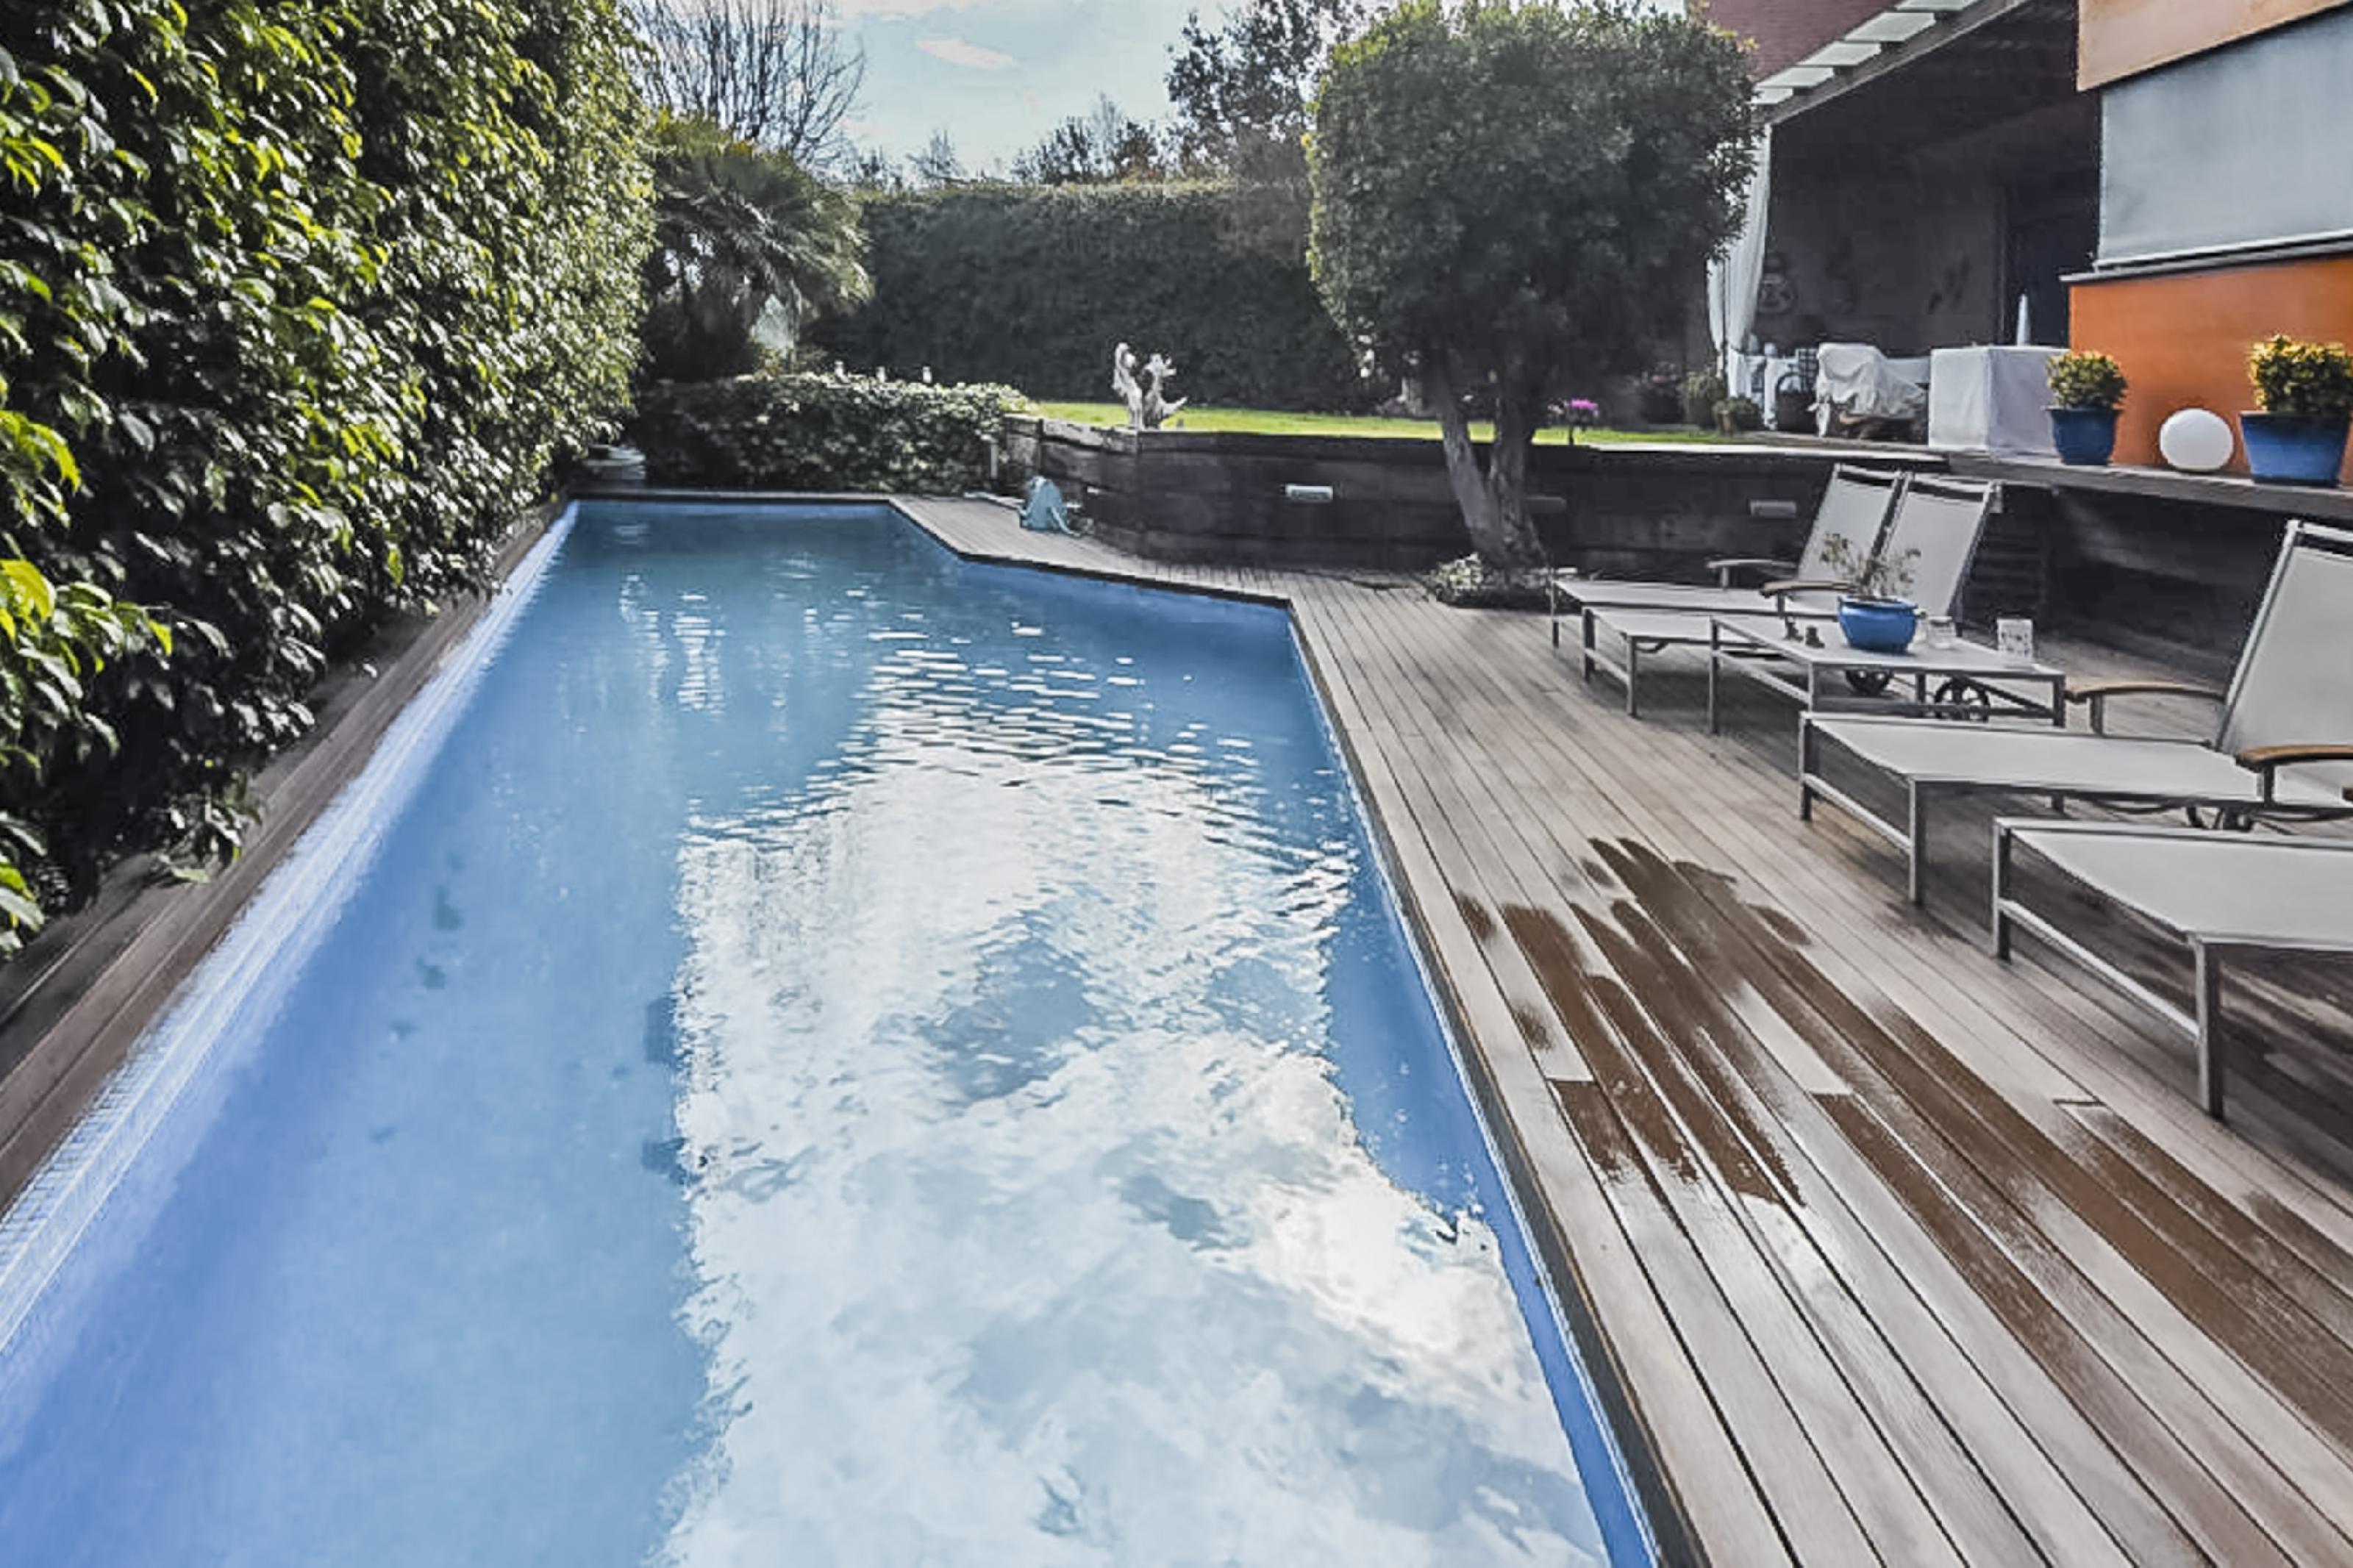 214424 Casa en venta en Les Corts, Pedralbes 5